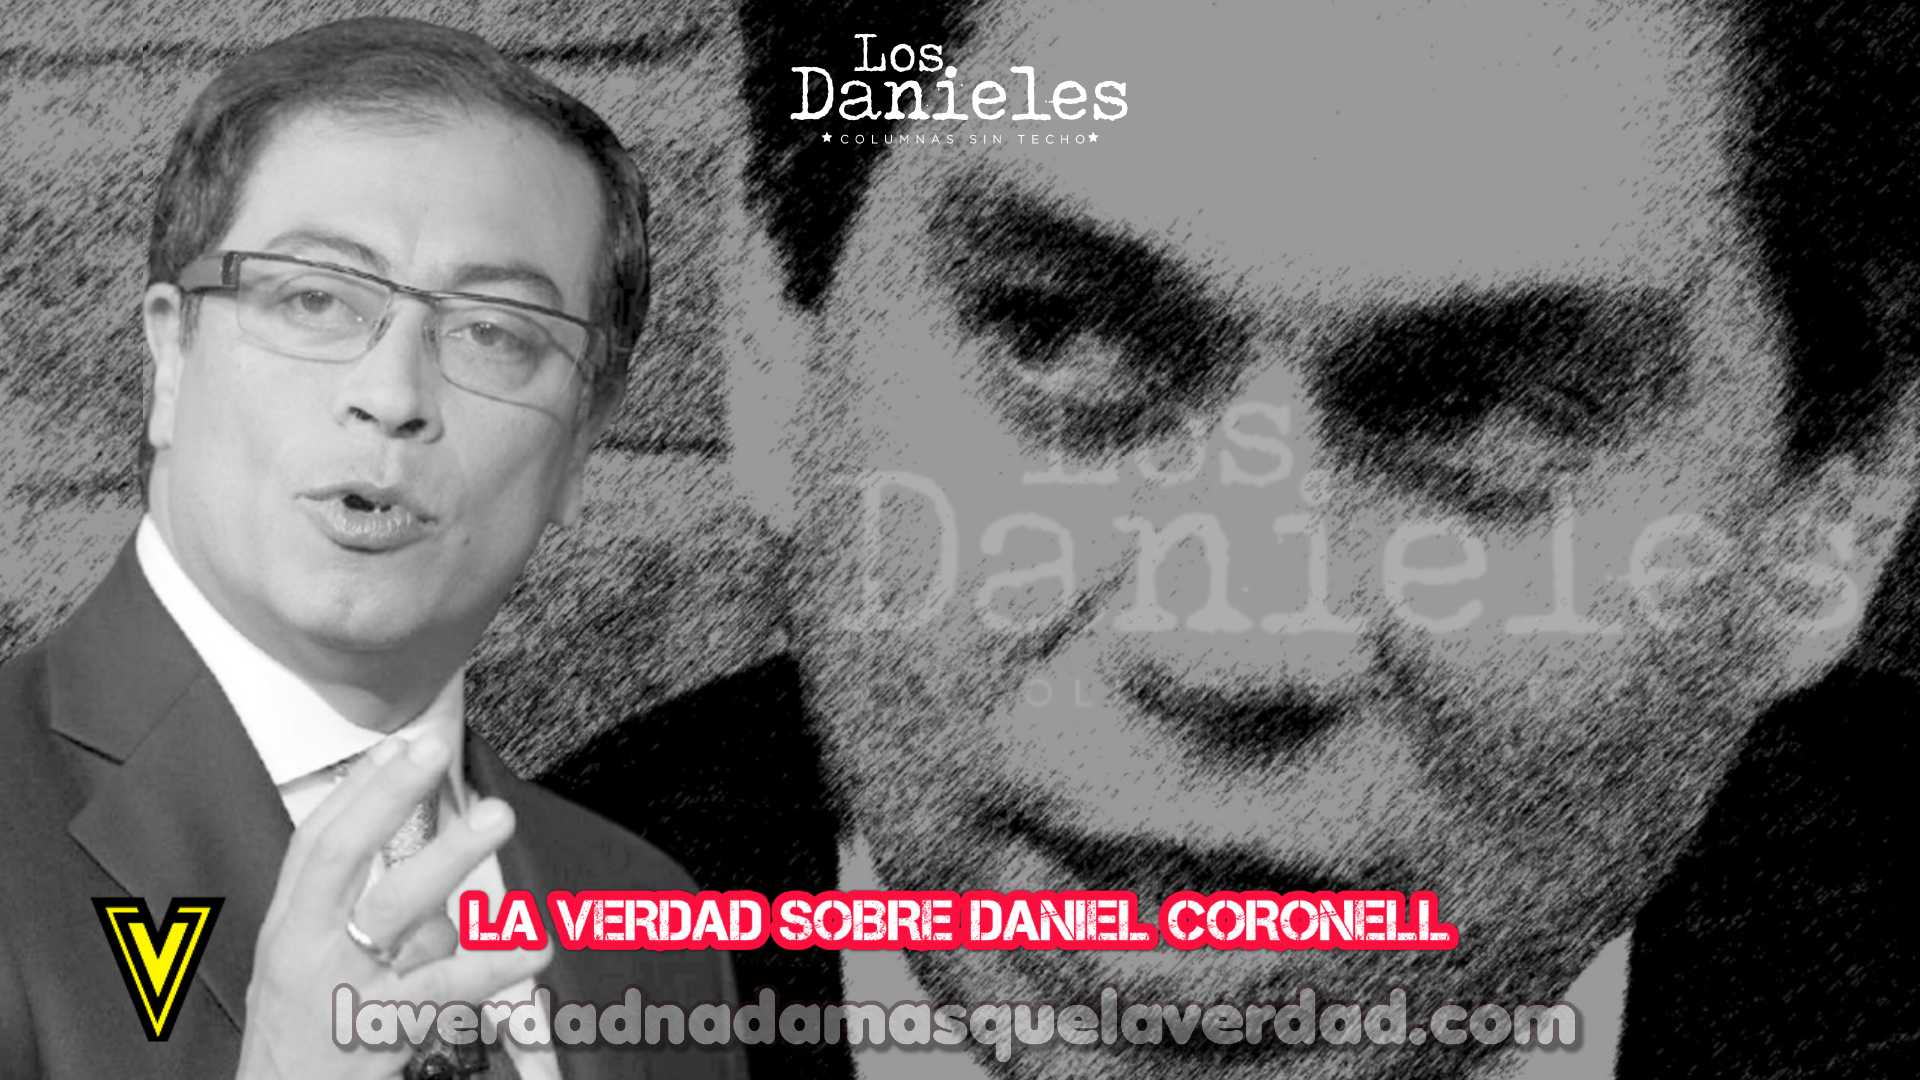 DANIEL CORONELL PETRO FAJARDO